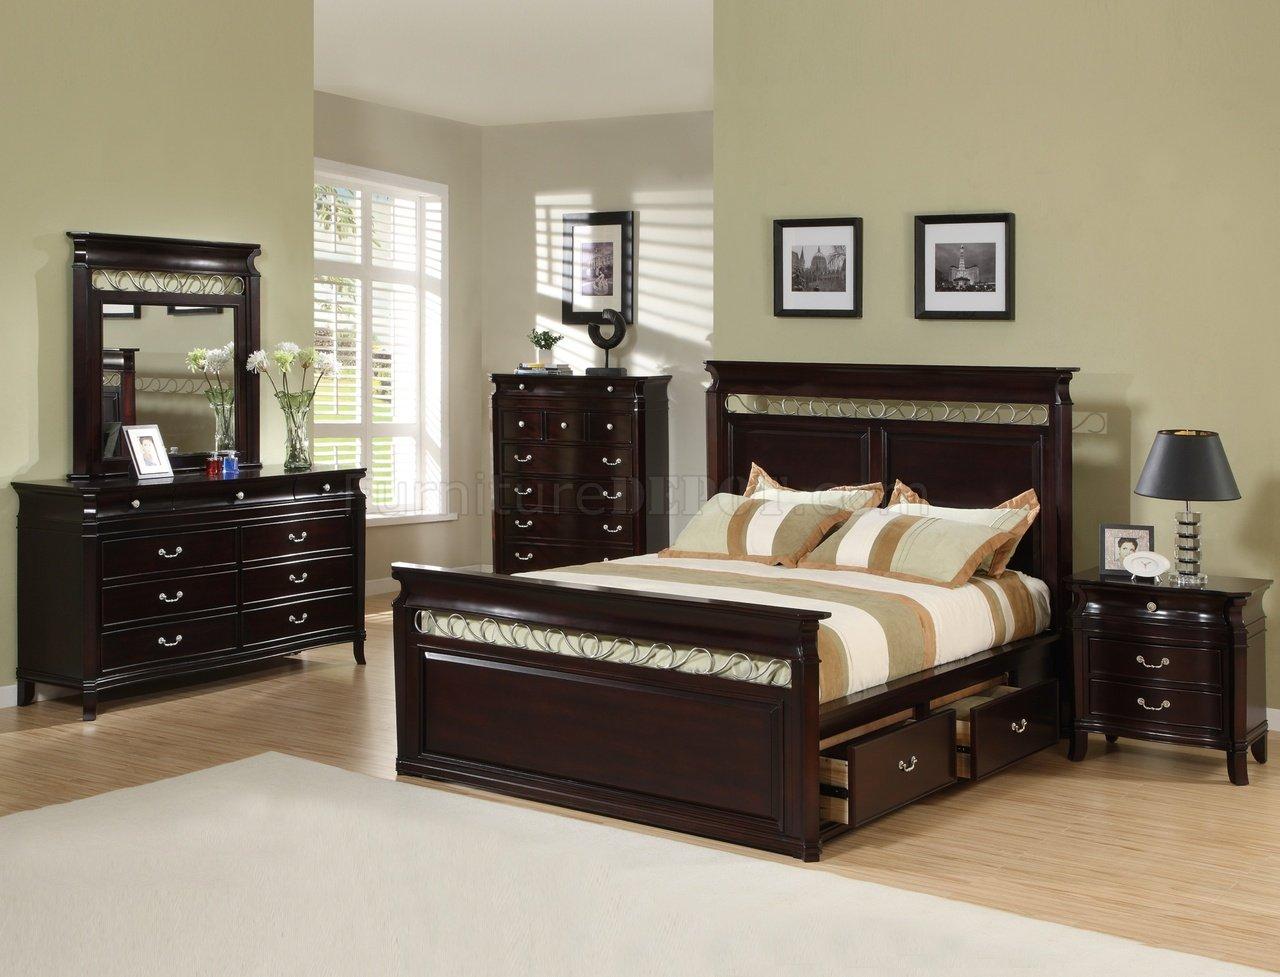 bedroom chair ideas caravan sports zero gravity reviews dark espresso finish contemporary w storage bed